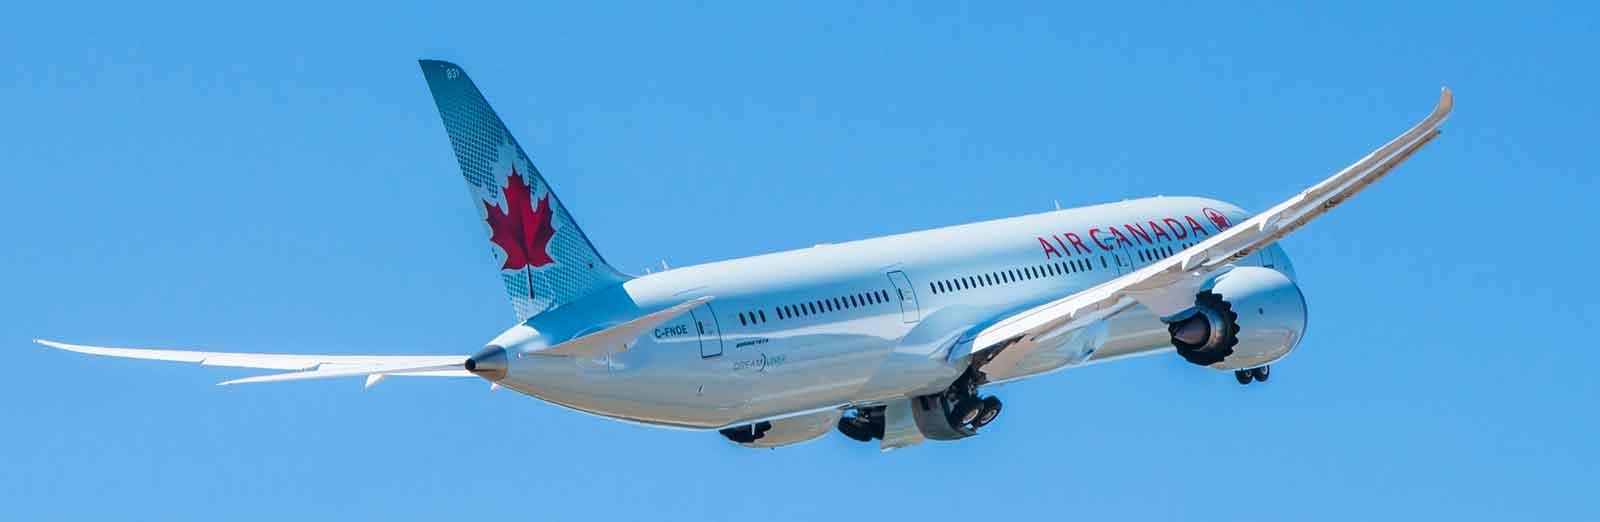 Air Canada B787-9 to fly Toronto Delhi route